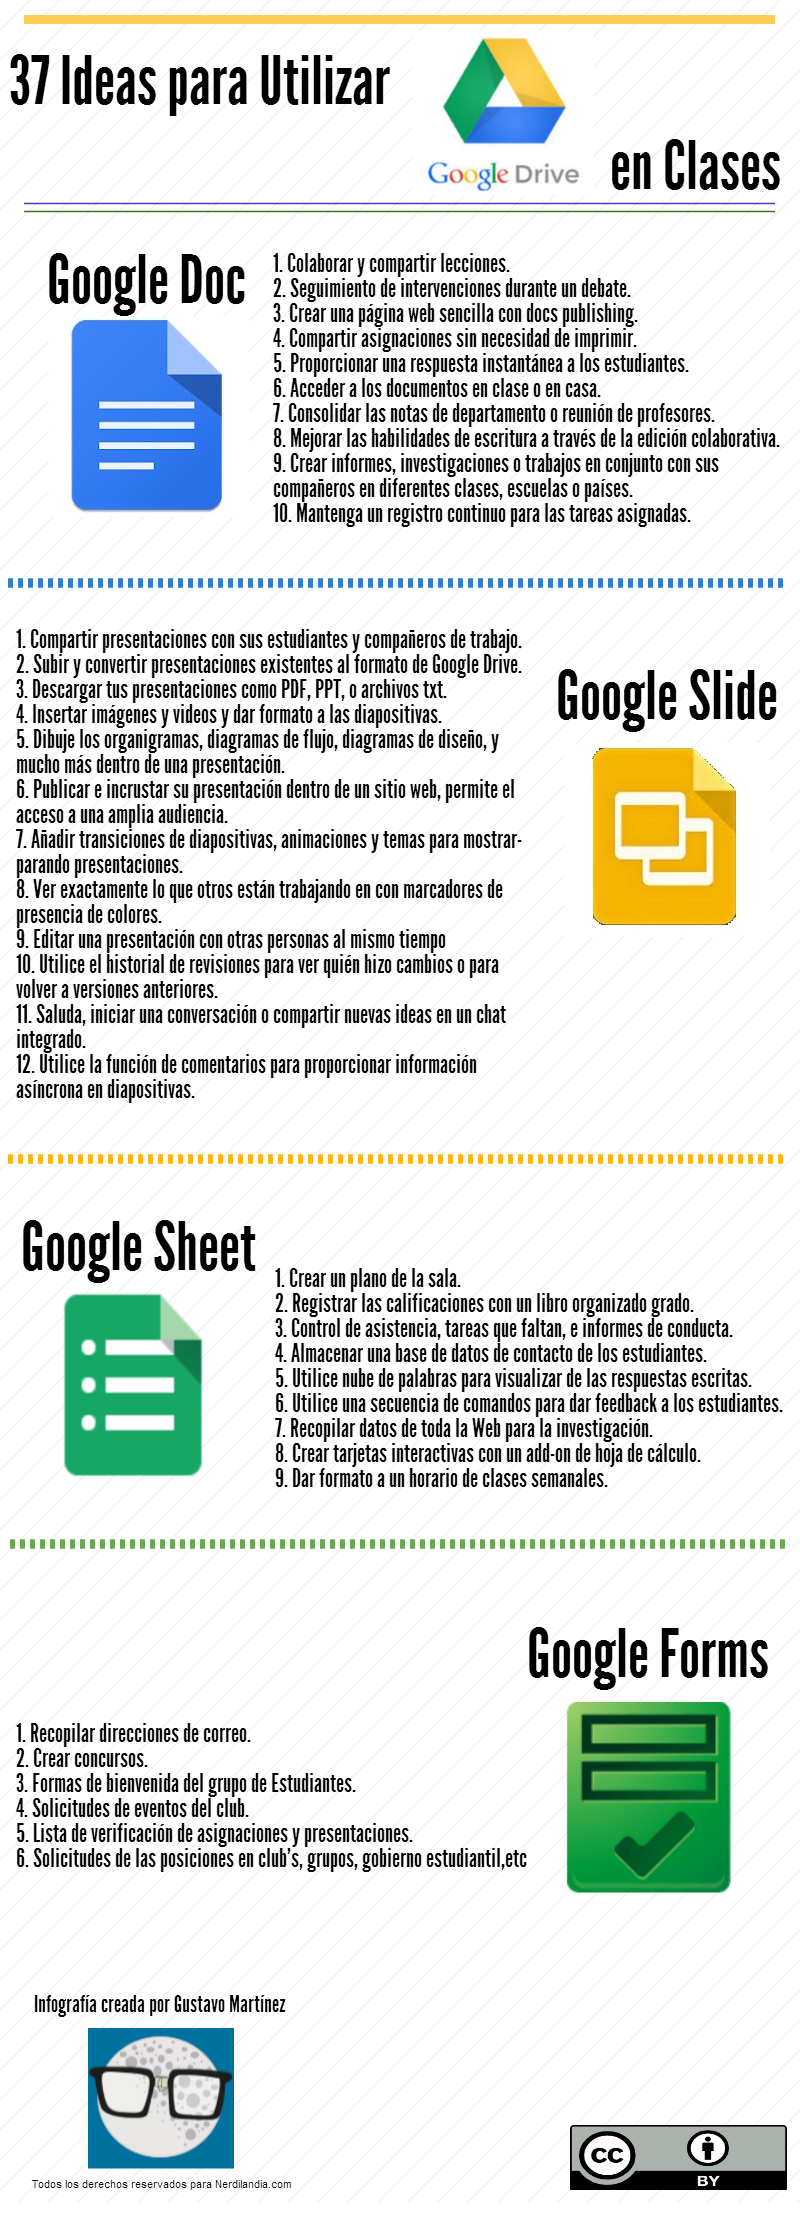 37 Ideas Para Usar Google Drive En Clase Infografia Infographic Education Tics Y Formacion Educacion Educacion Virtual Google Drive